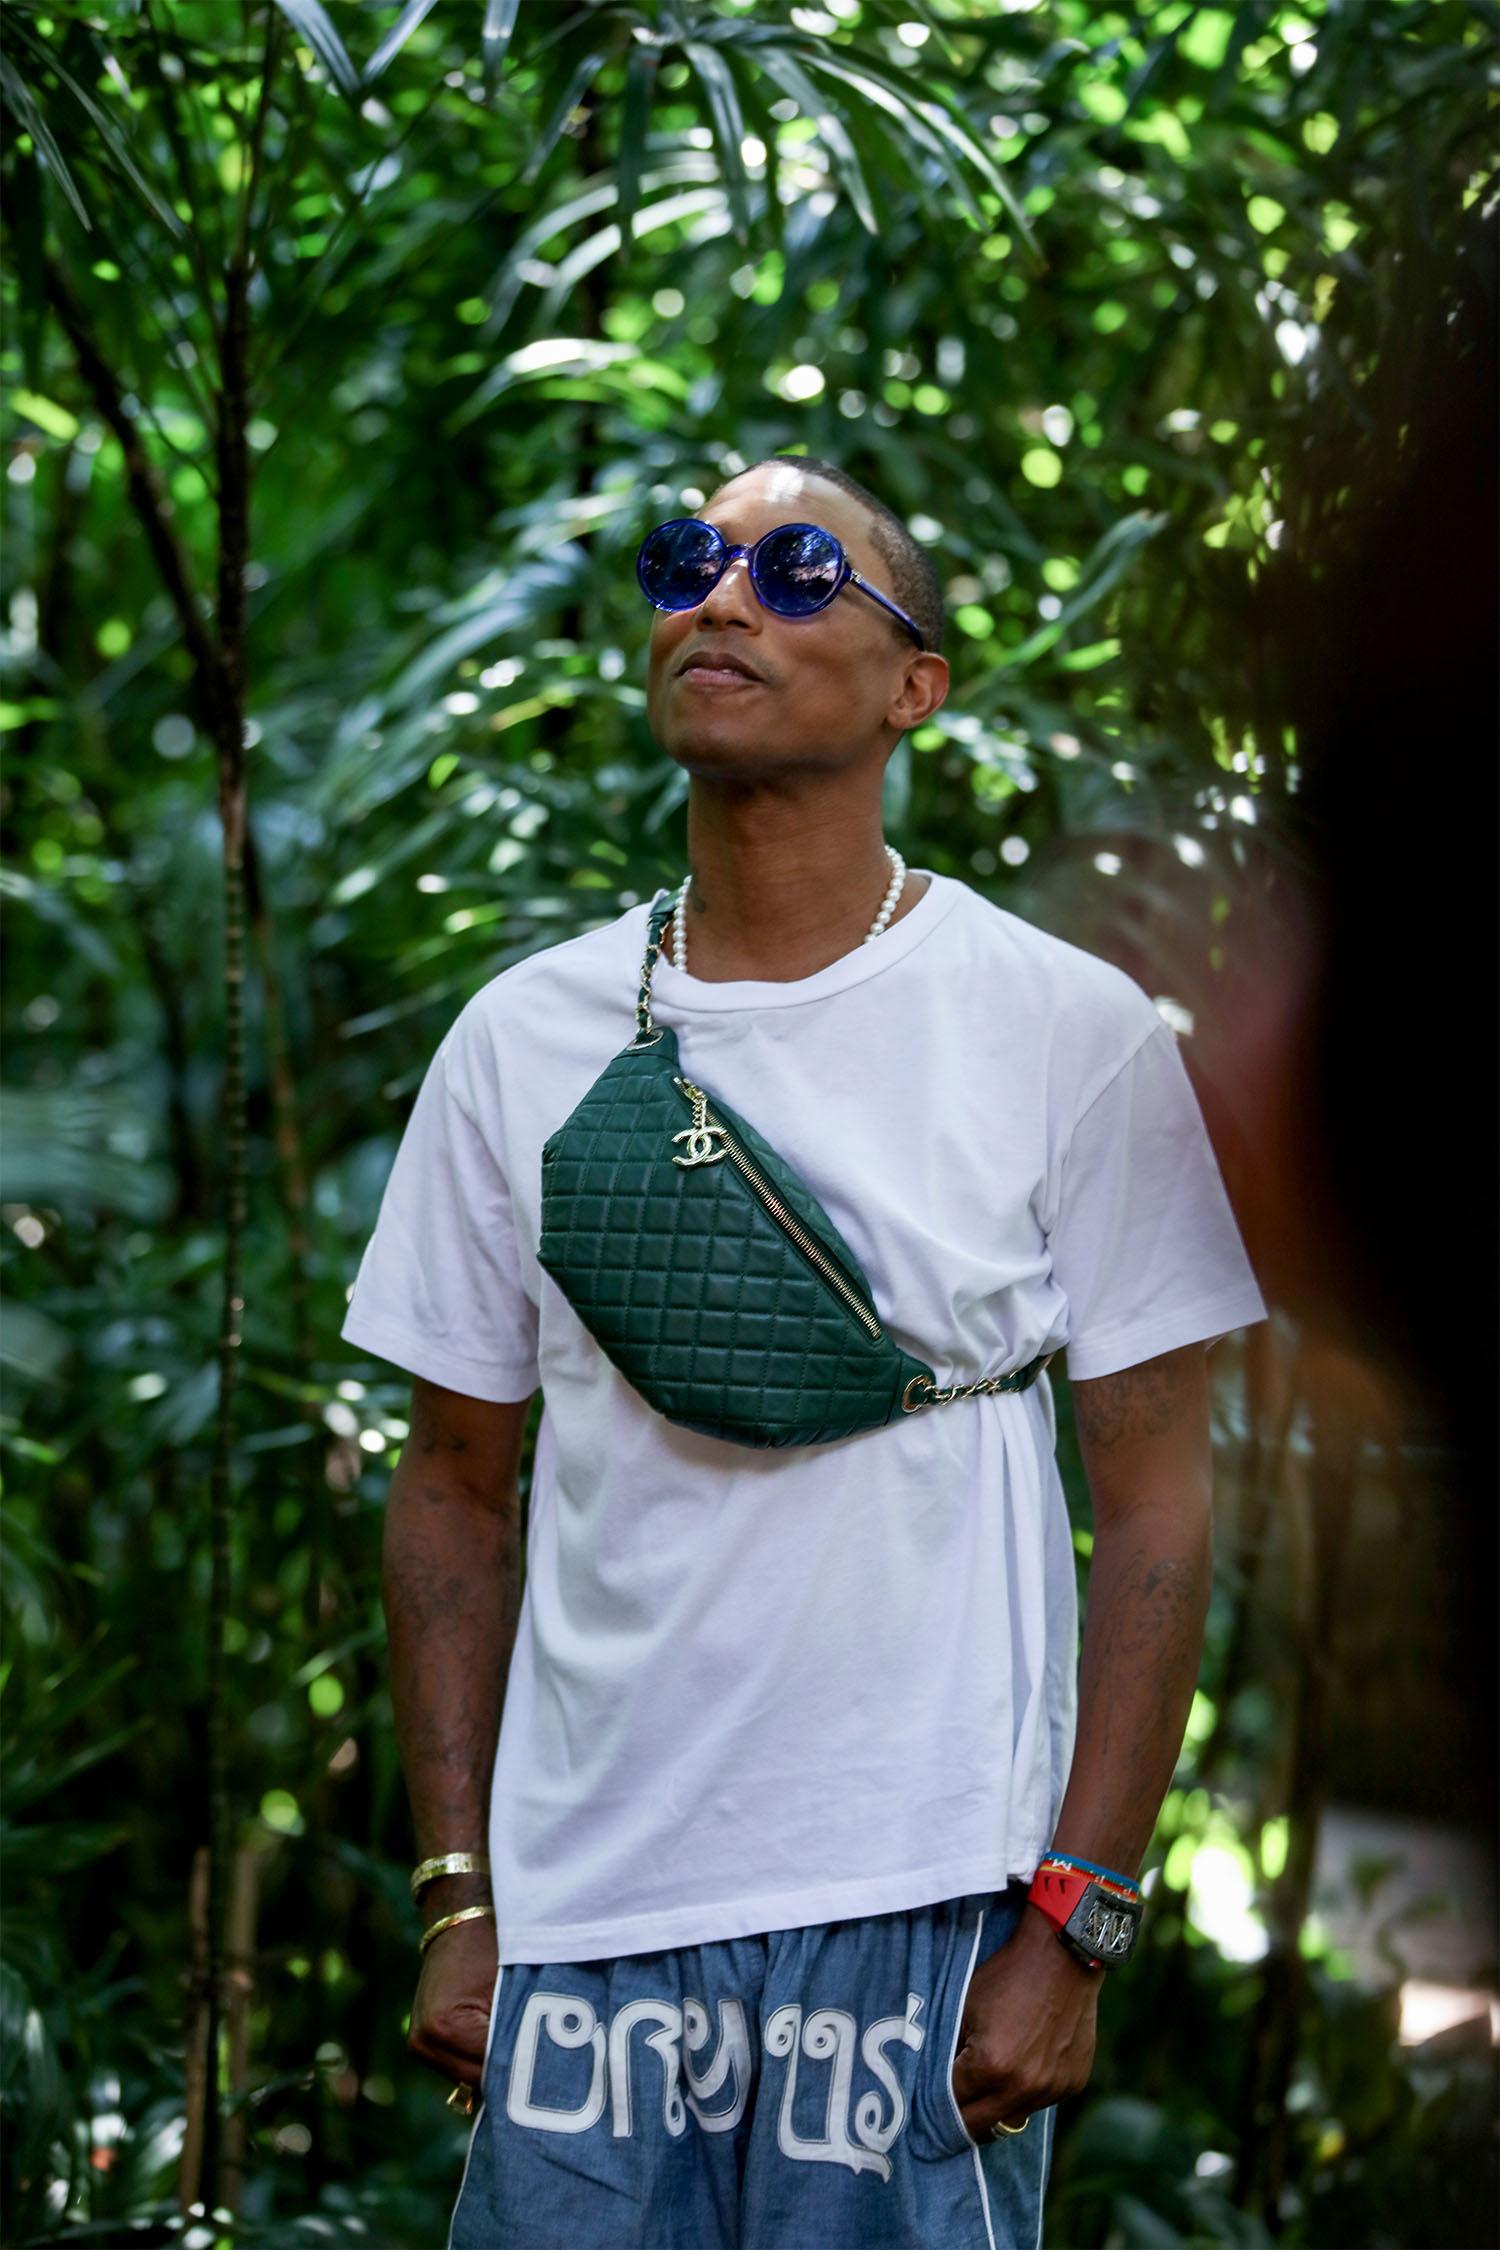 BST Chanel Cruise 2019 ở Bangkok Pharrell Williams